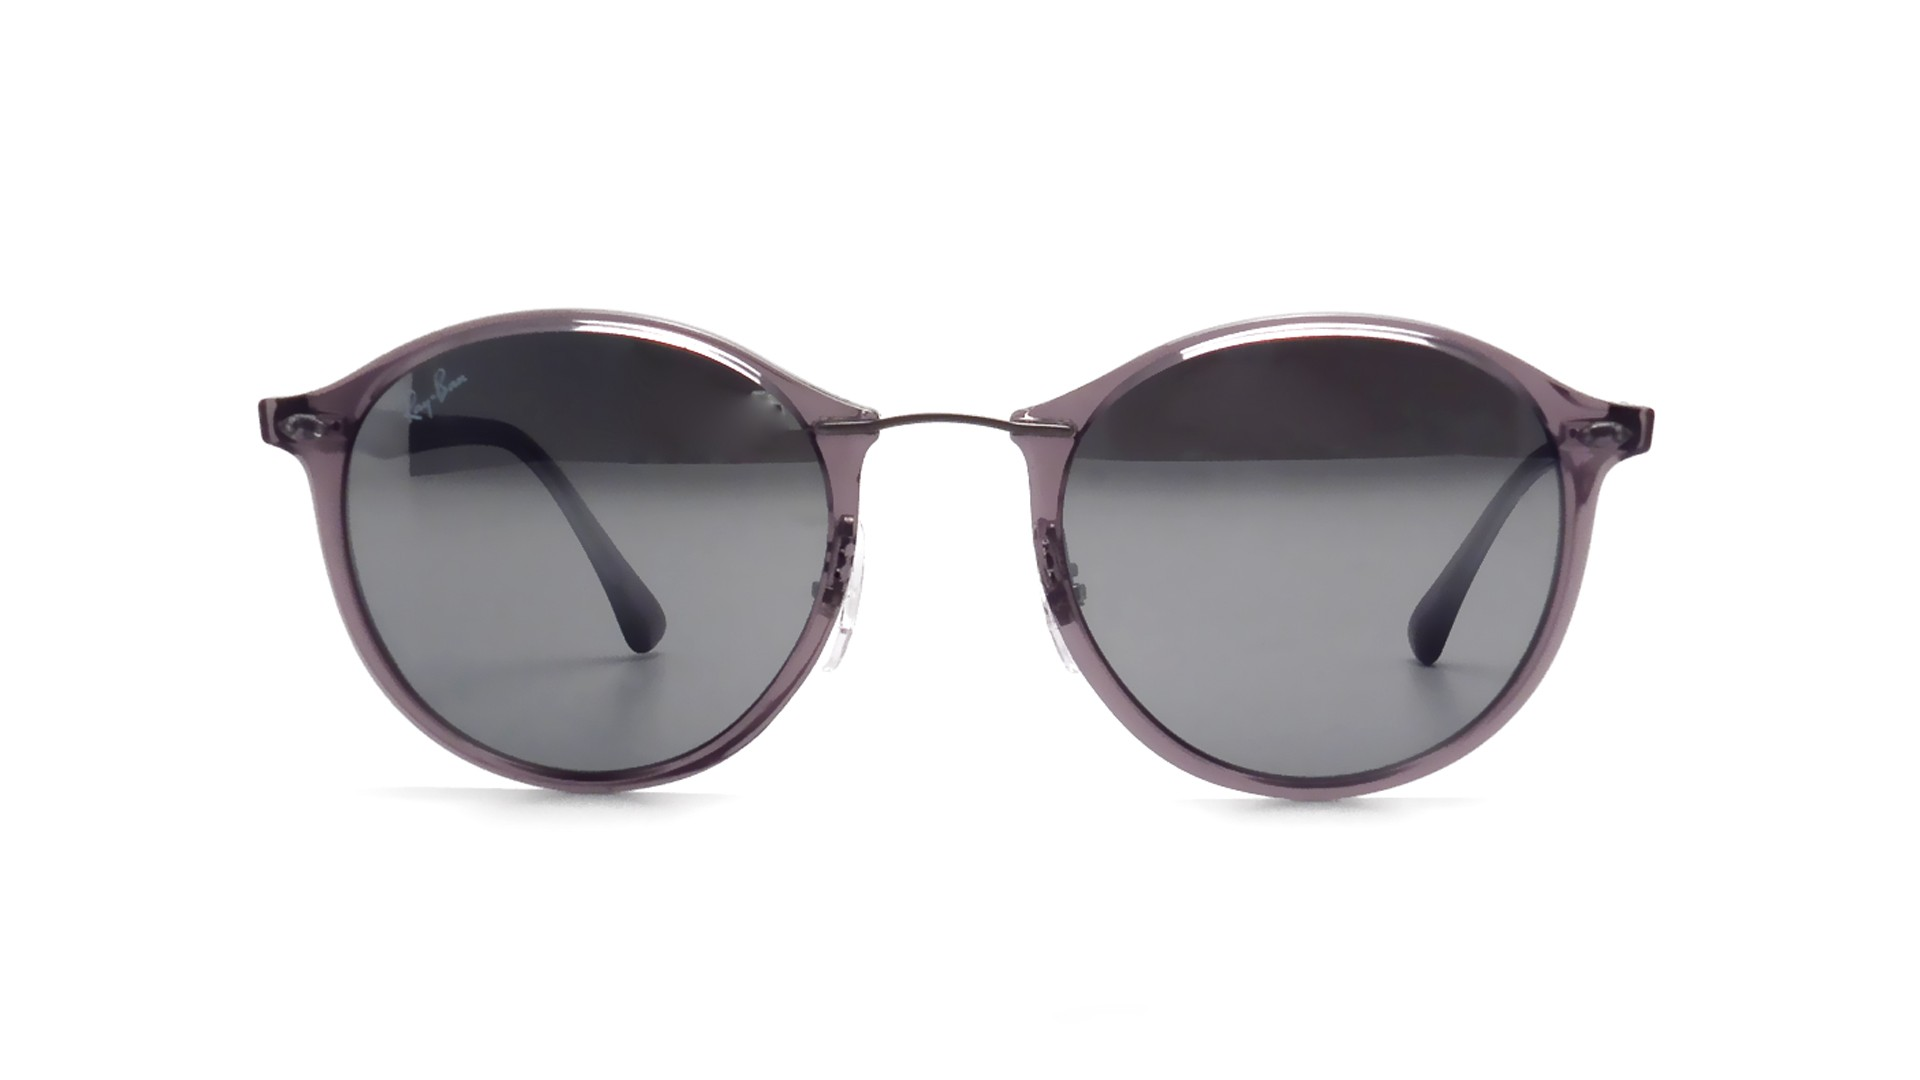 e8c9dbf4eb Sunglasses Ray-Ban Tech Light Ray Tech Grey RB4242 620088 49-21 Medium  Mirror